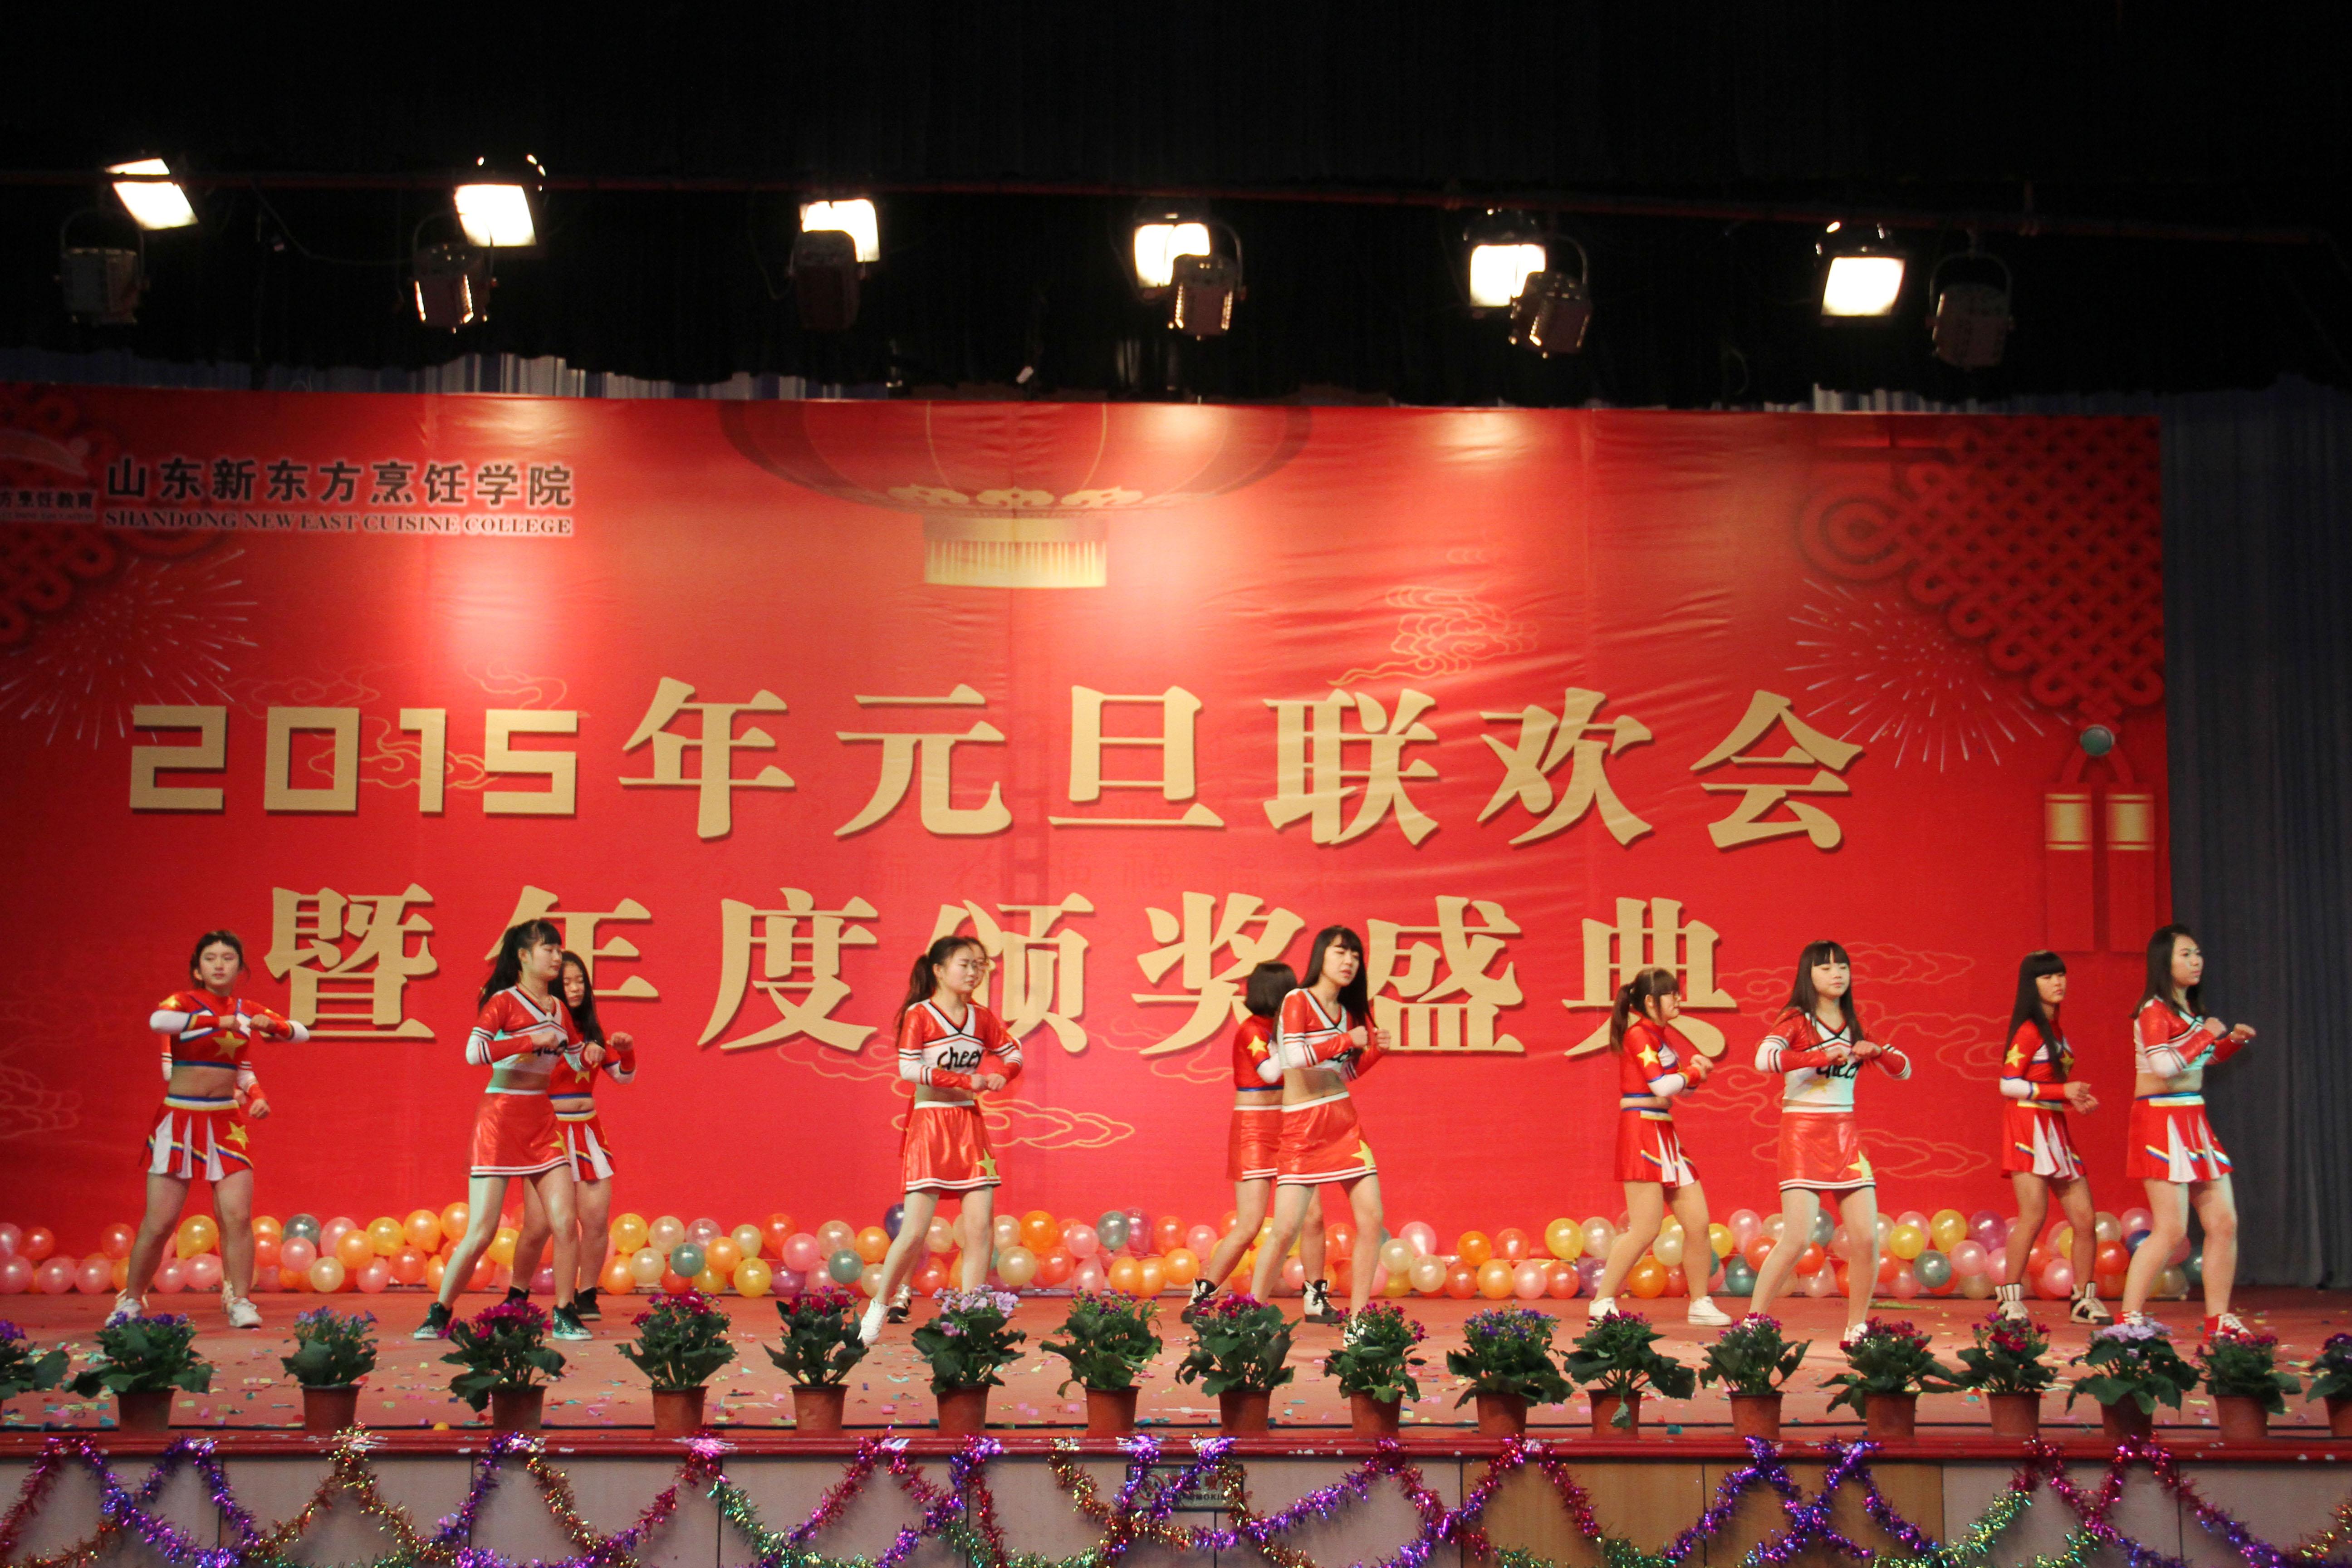 <b>山东新东方烹饪学院2015年元旦联欢会暨年度颁奖盛典 </b>